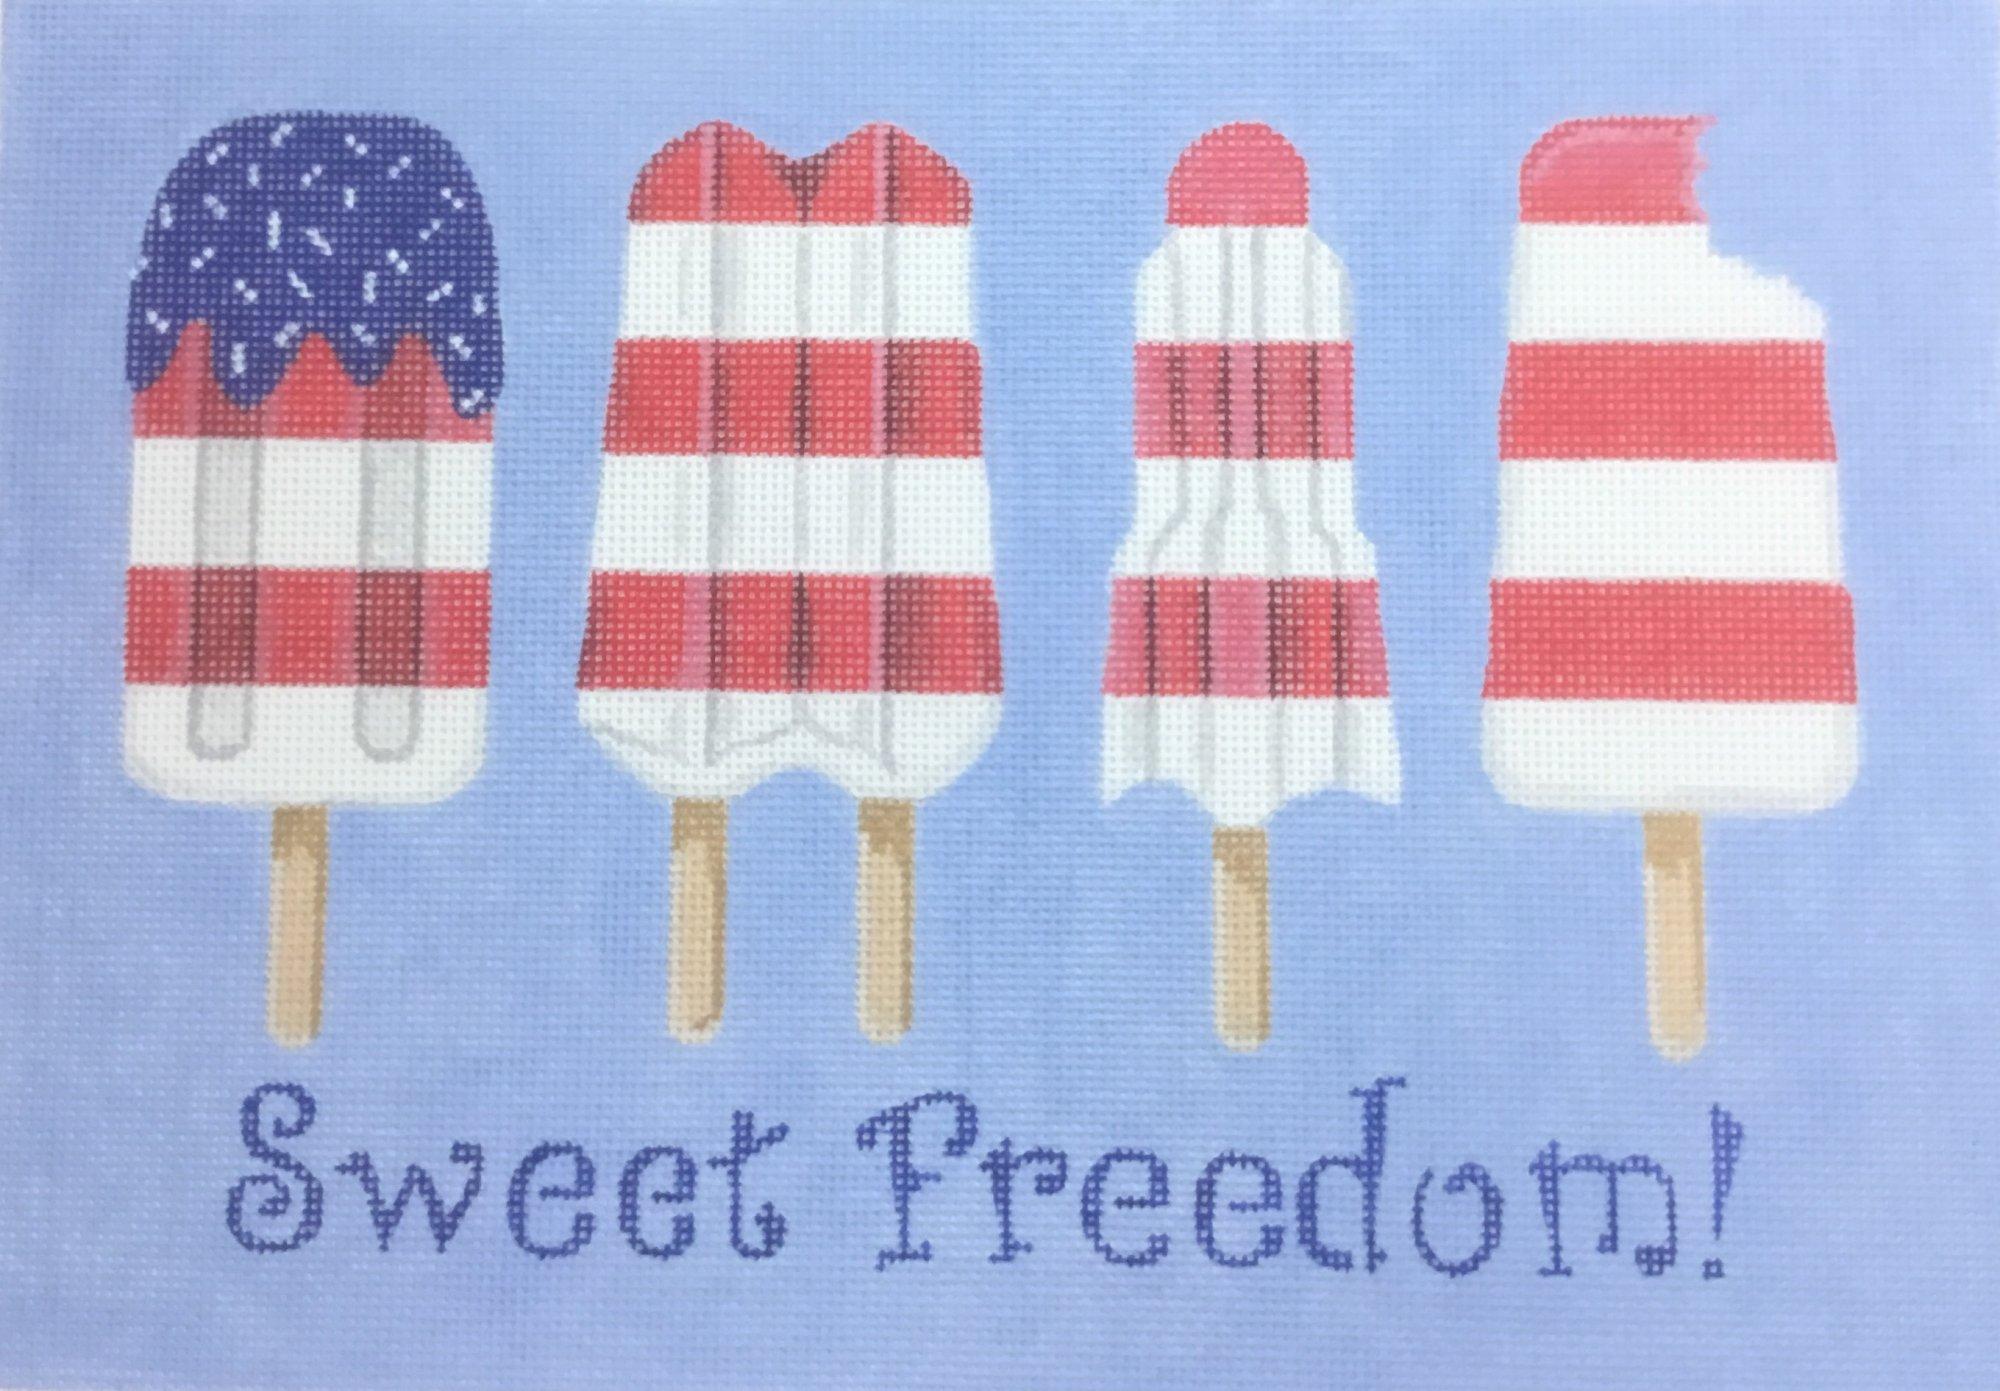 Sweet Freedom,18 ct.,7 1/2x10 1/2